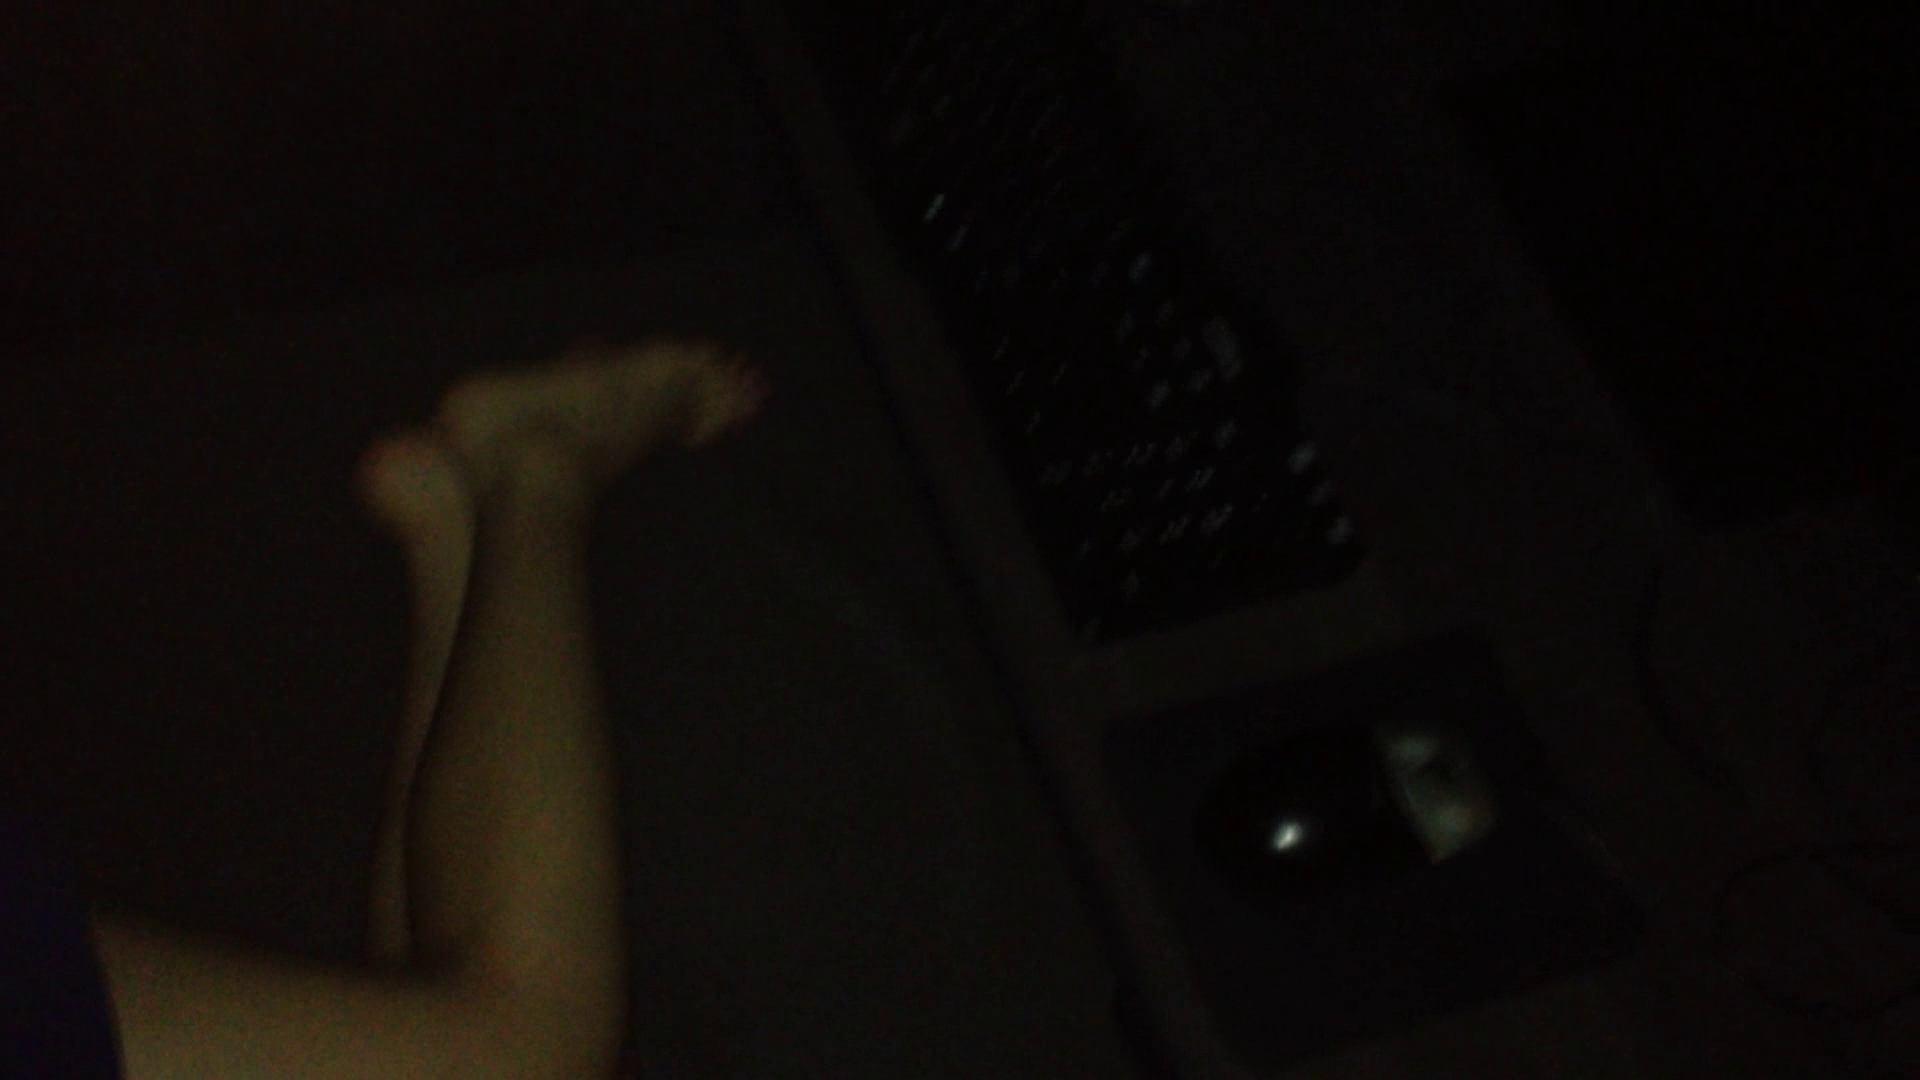 vol.45 【YMちゃん】現役JD純白パンツのお嬢様 お嬢様のエロ動画 エロ無料画像 104枚 17